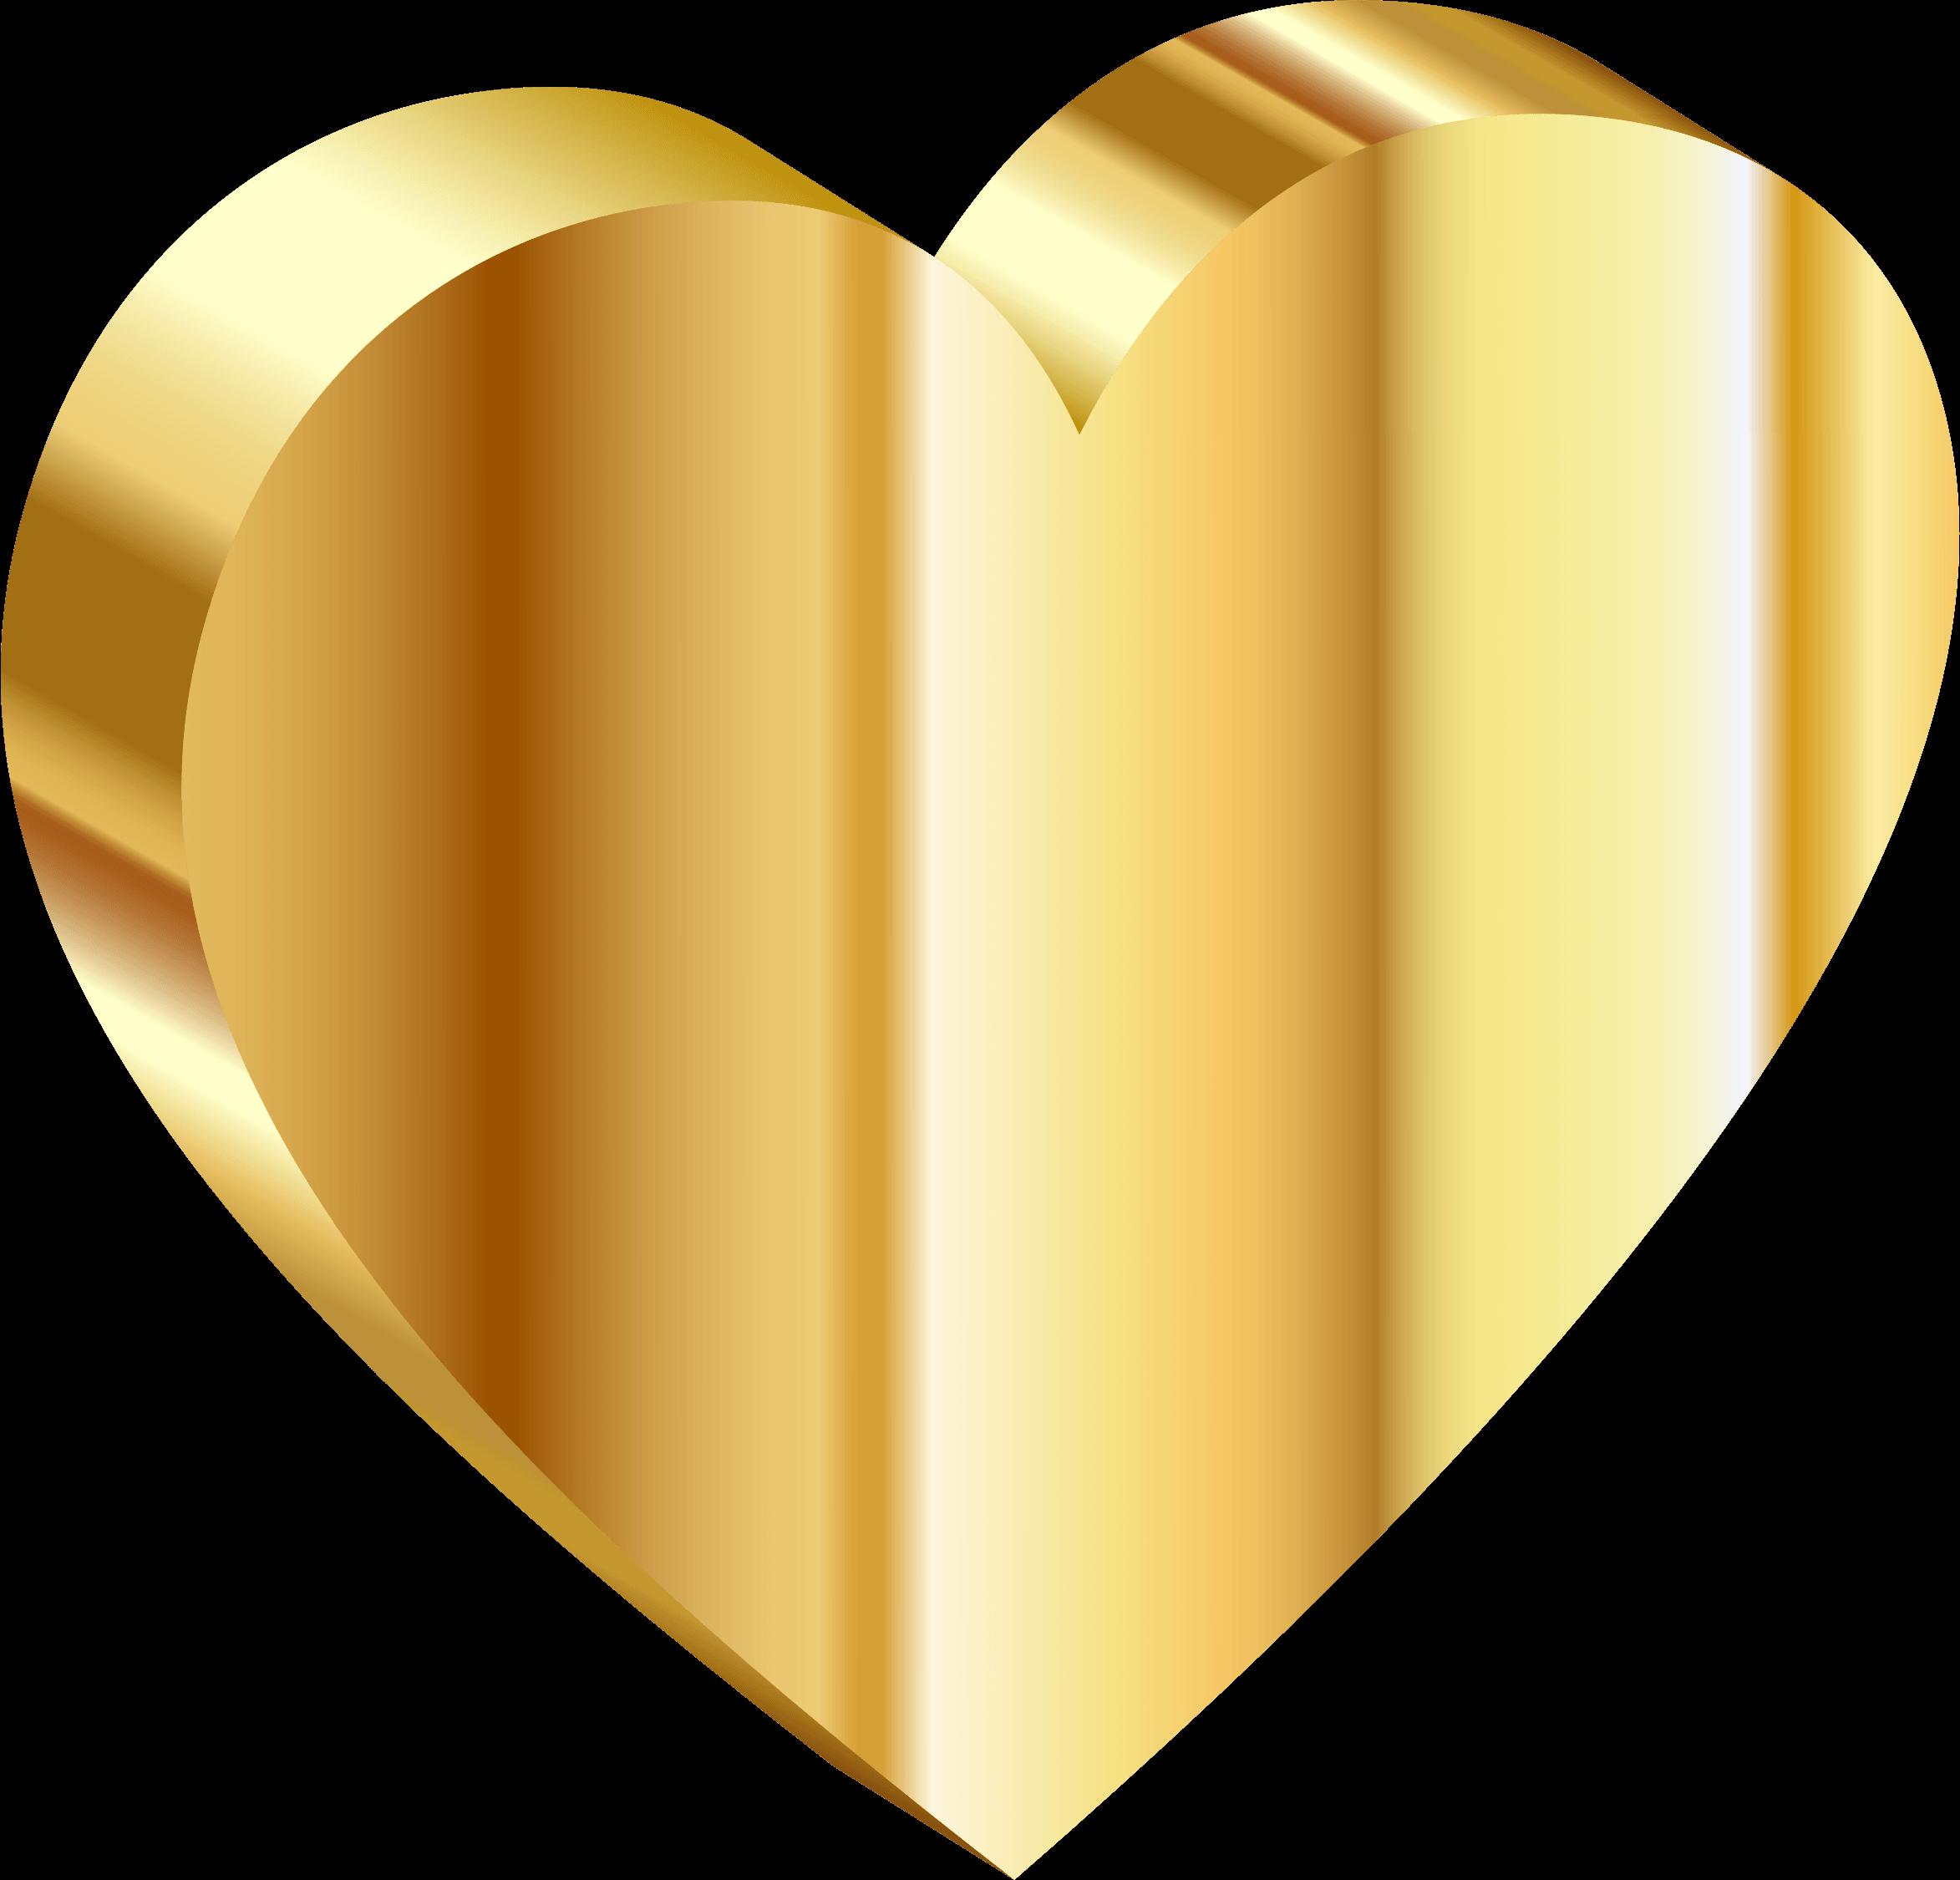 Heart Block Cliparts.